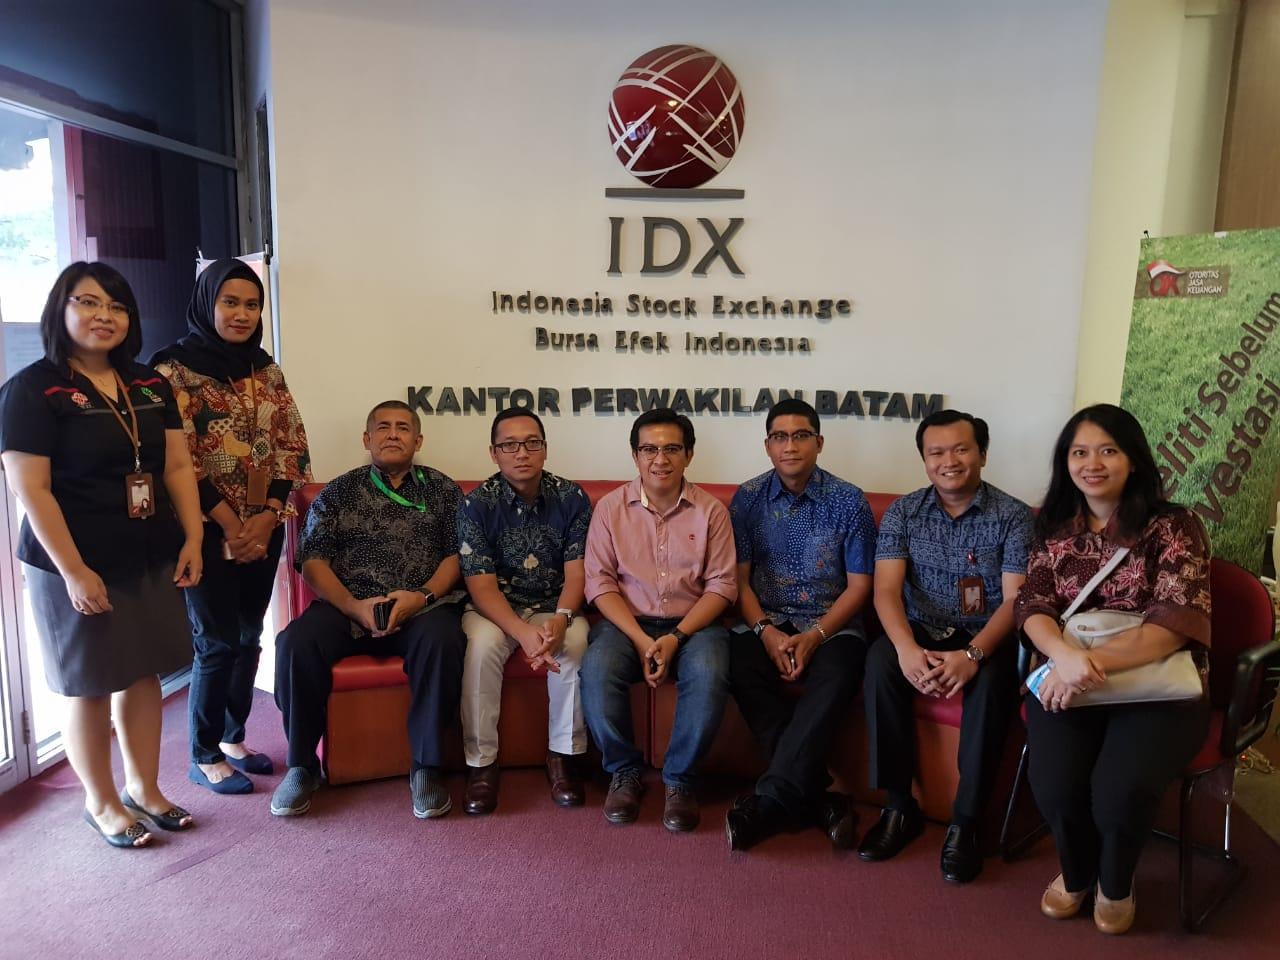 Kunjungan ke Kantor Perwakilan (KP) IDX Batam, Kepulauan Riau